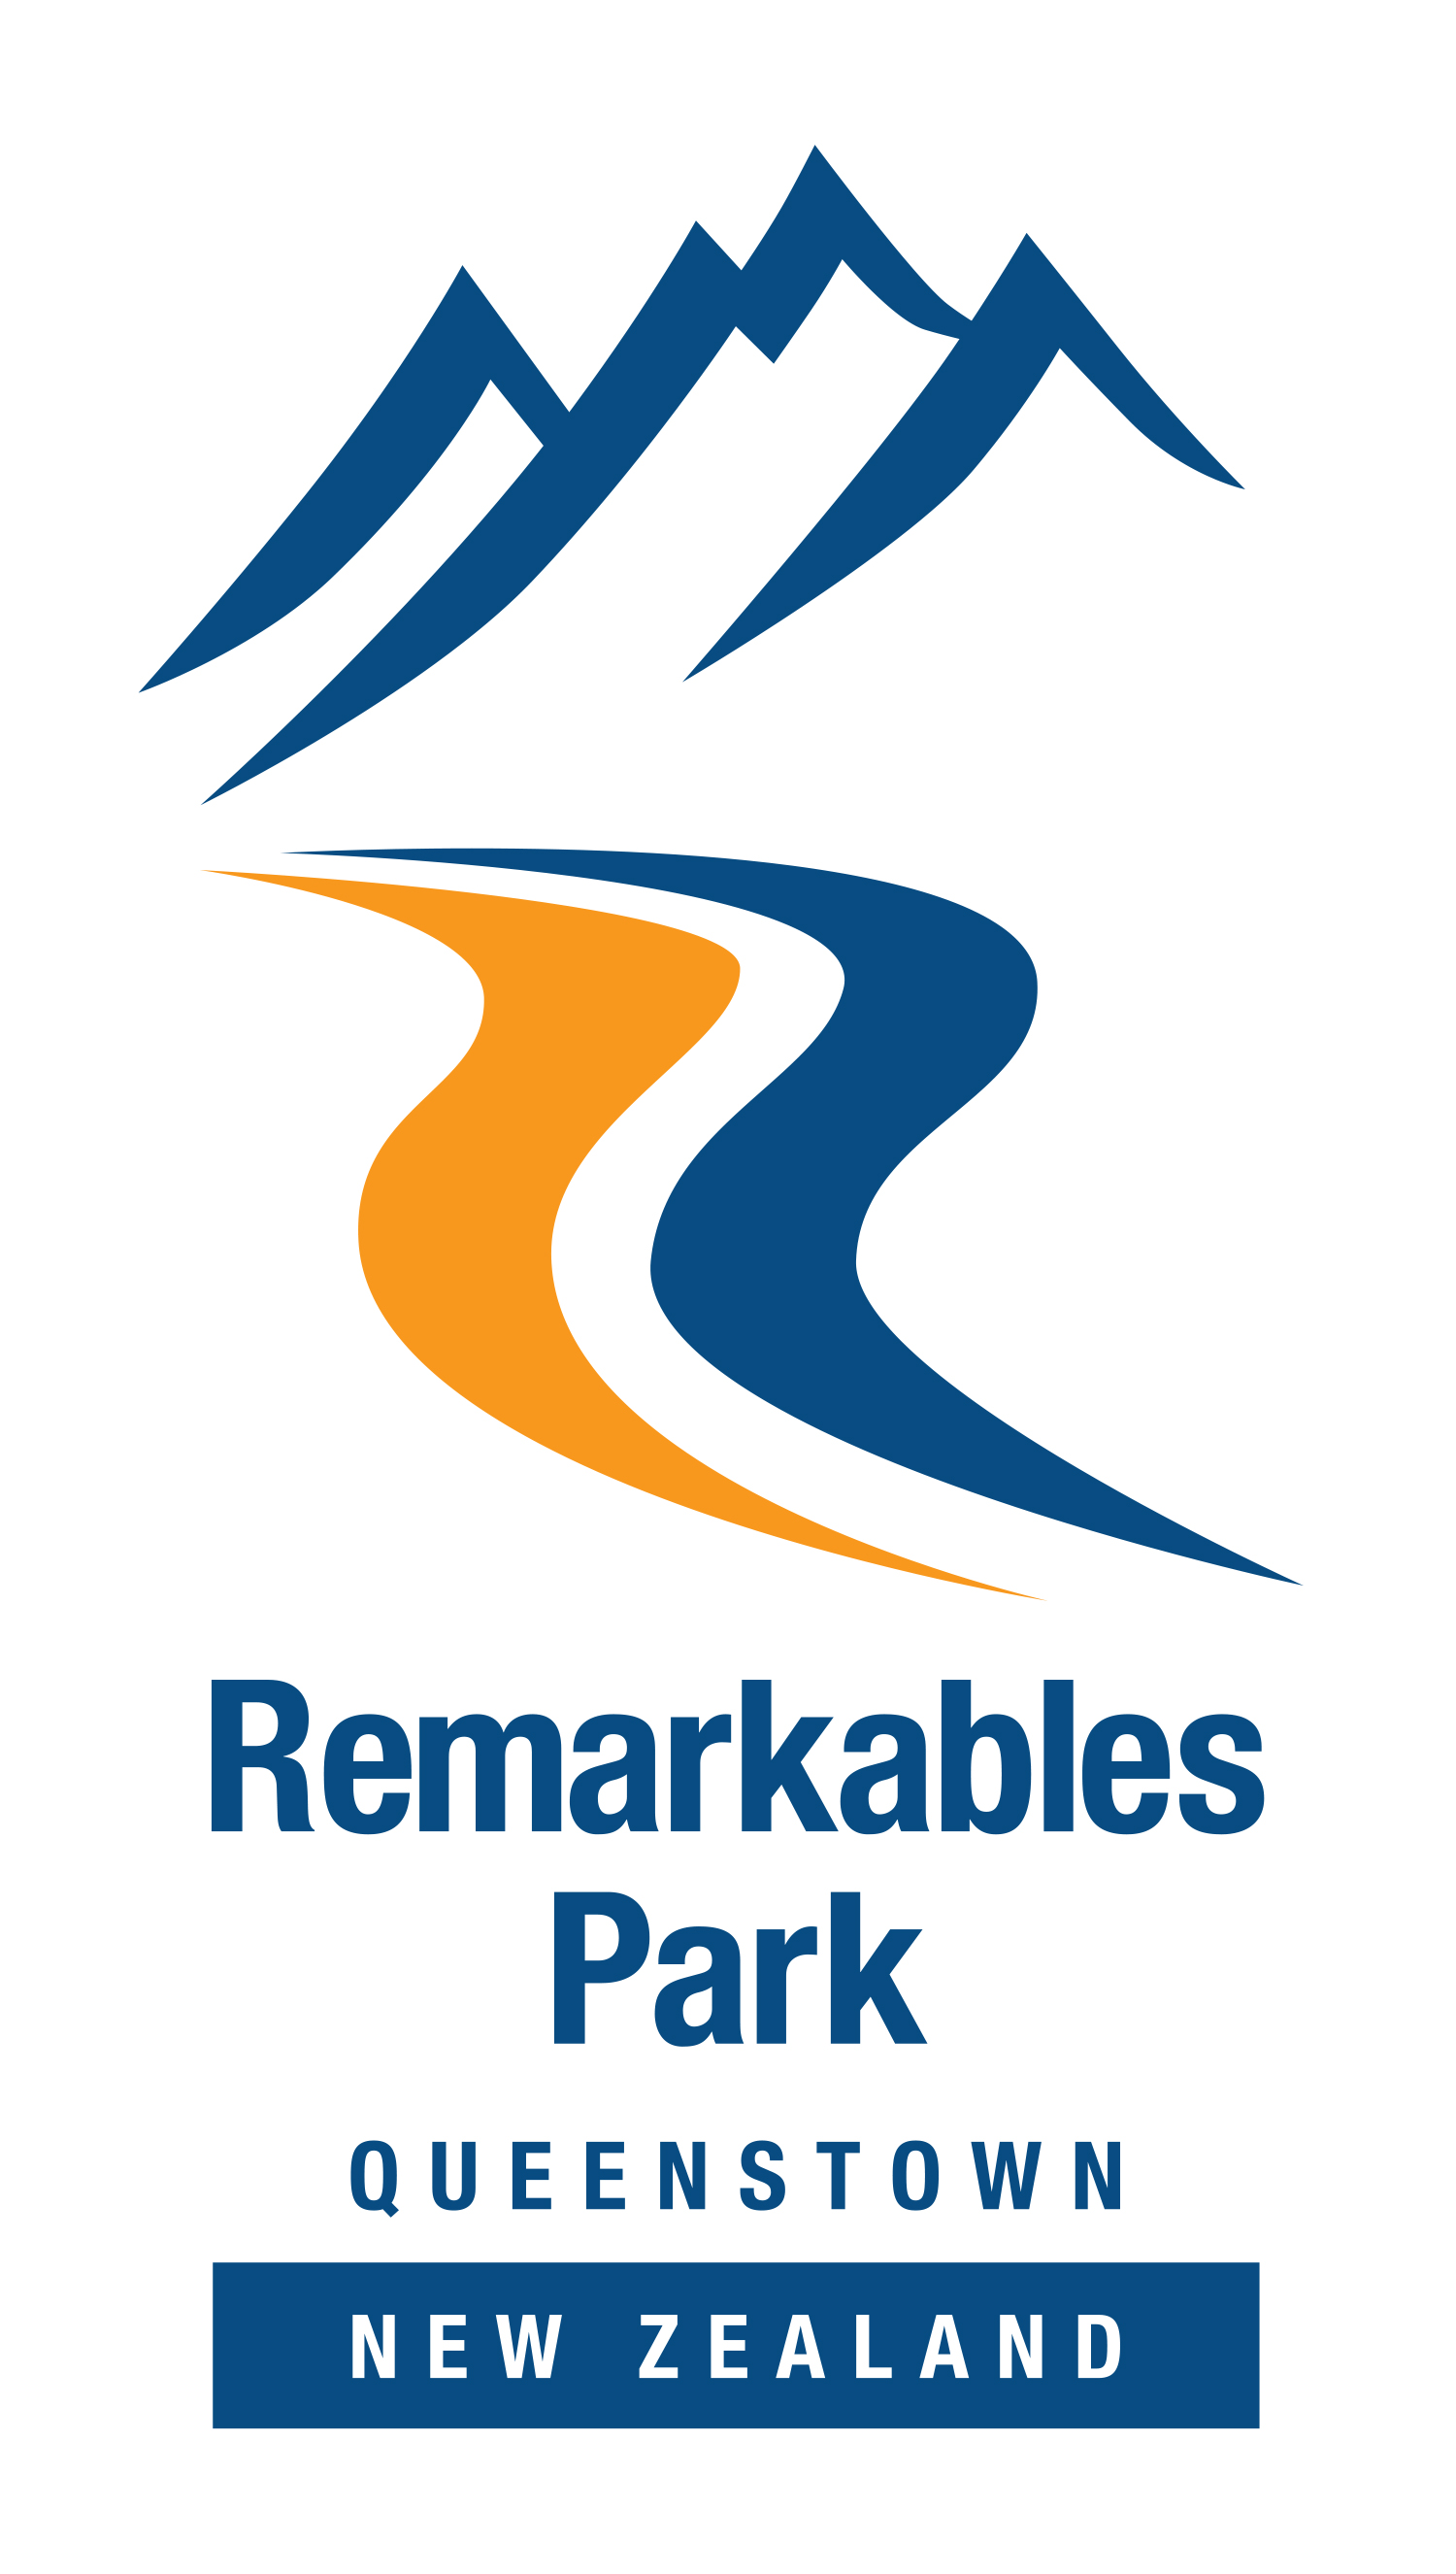 Remarkables Park Ltd